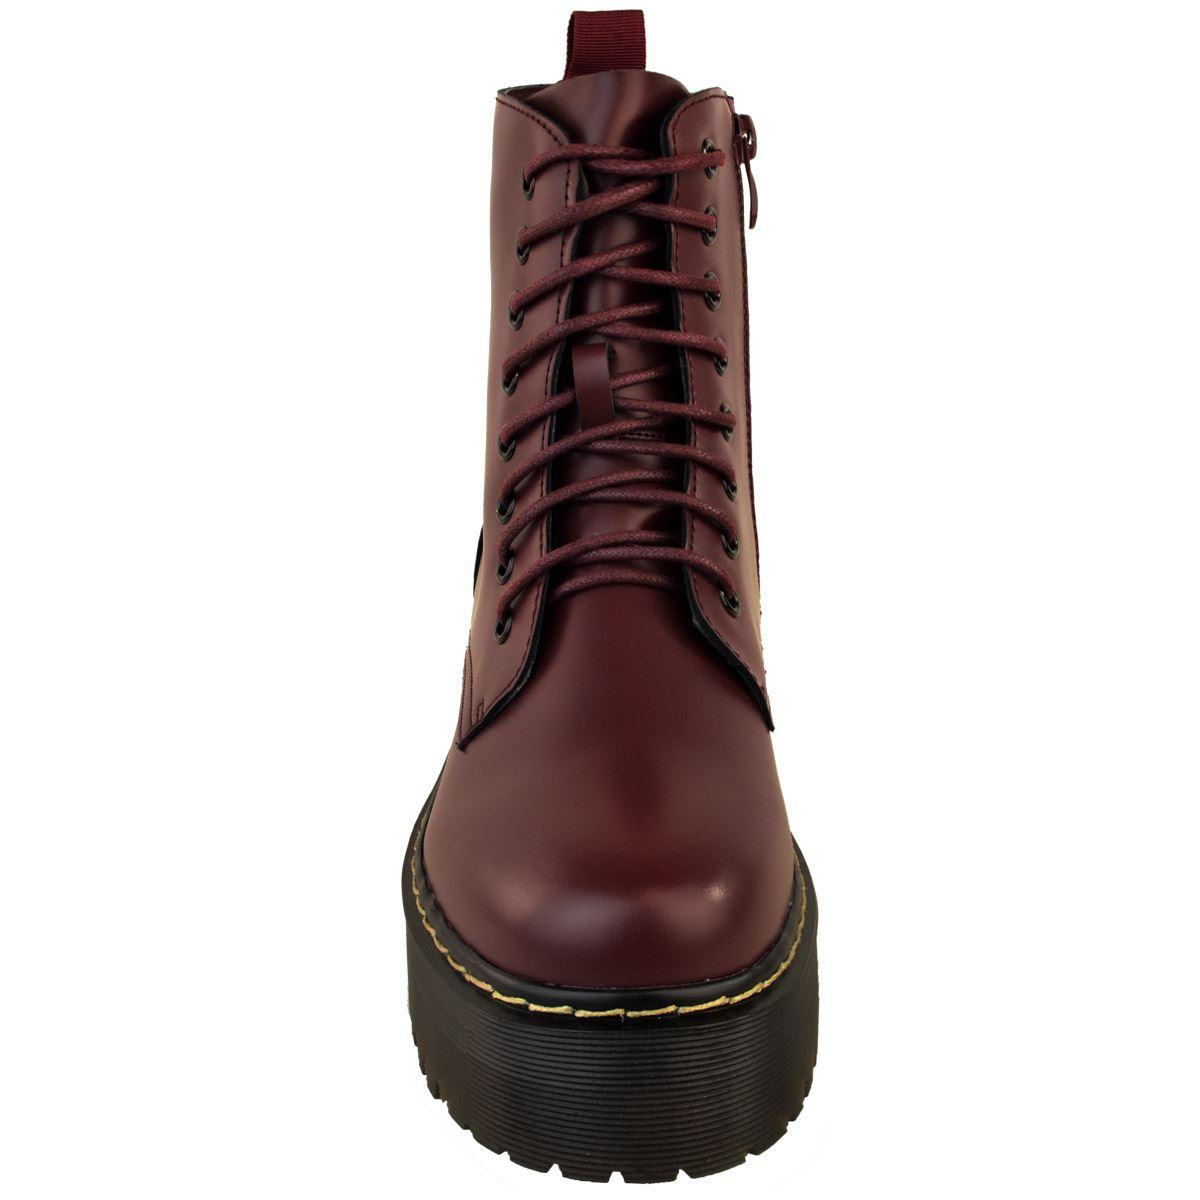 Womens-Ladies-Chunky-Lace-Up-Ankle-Boots-Platform-Icon-Retro-Goth-Punk-Black miniatuur 16